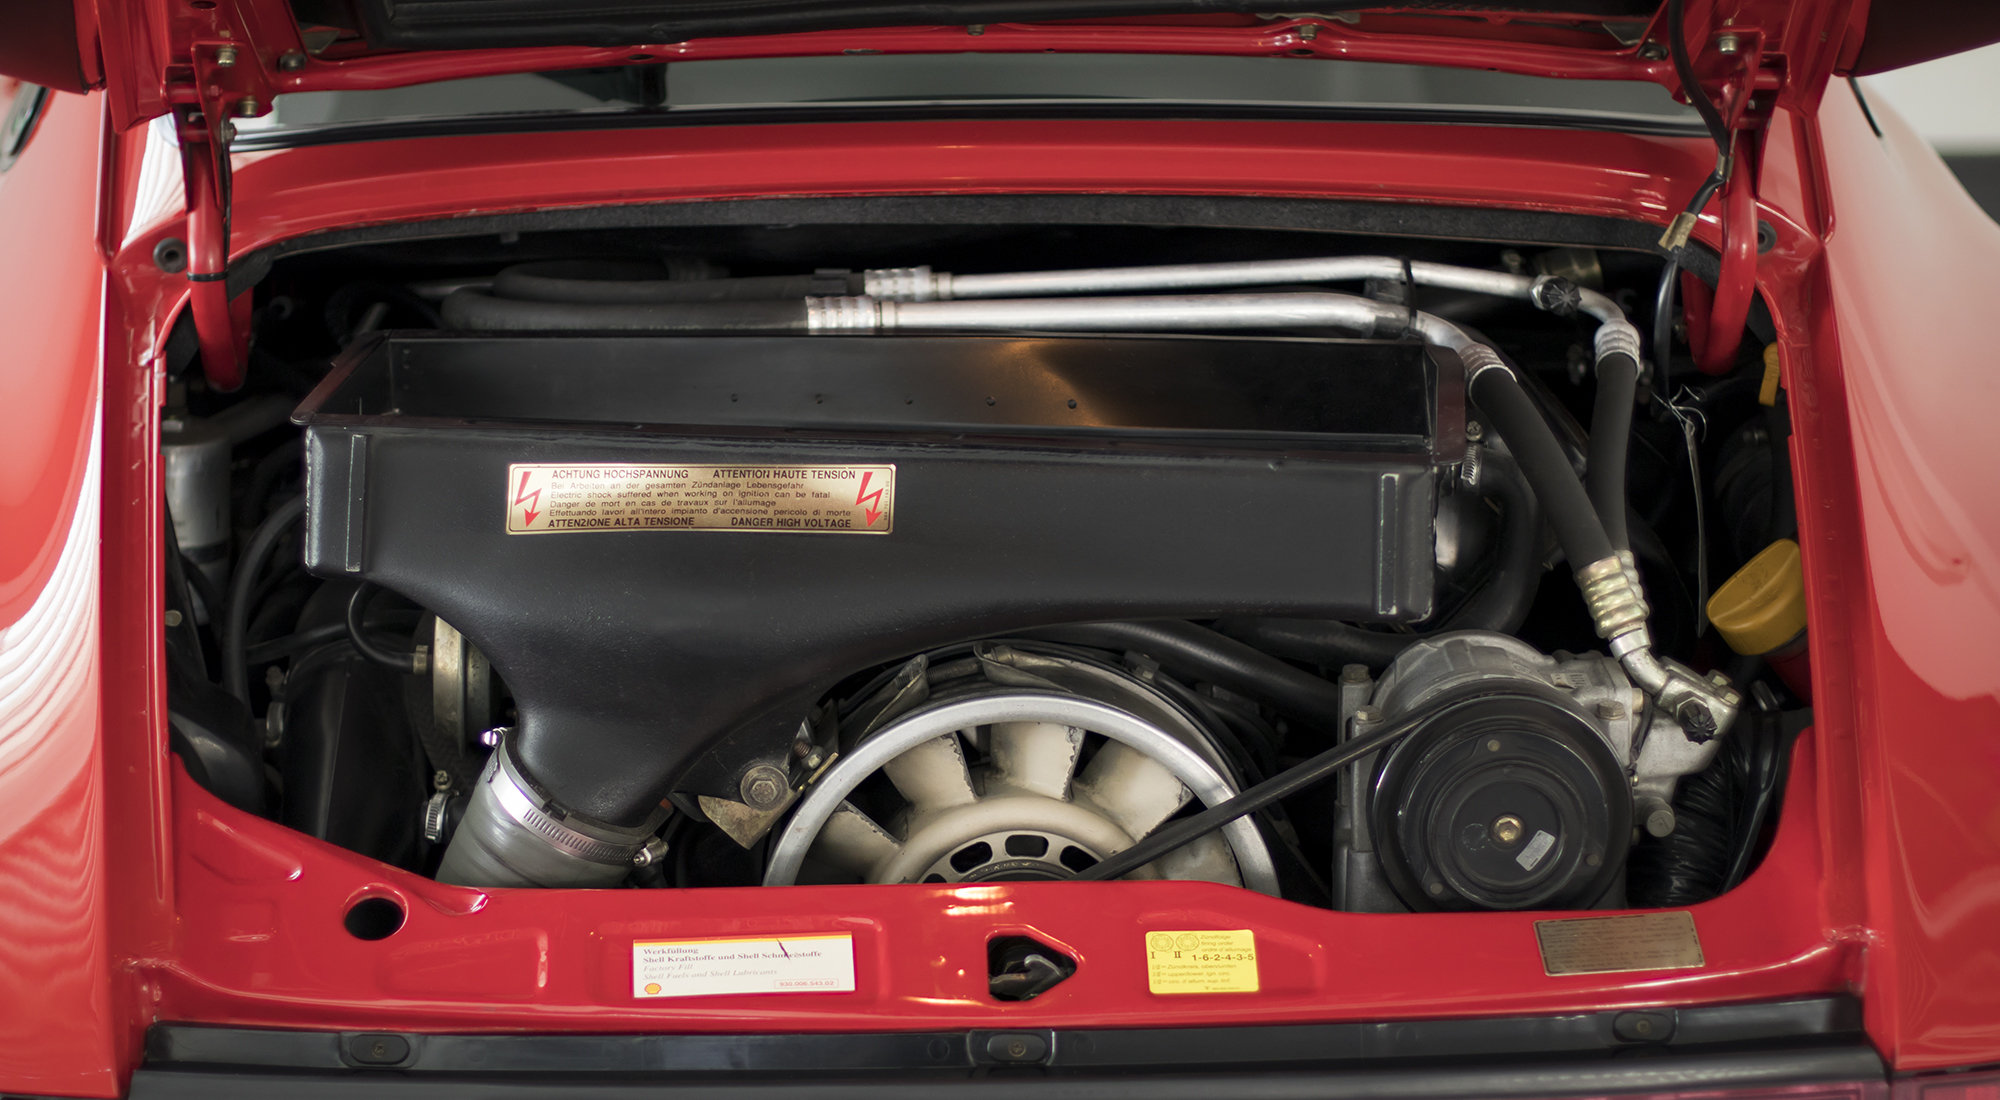 Porsche 964 Turbo 3.6 (1993) For Sale (picture 4 of 6)